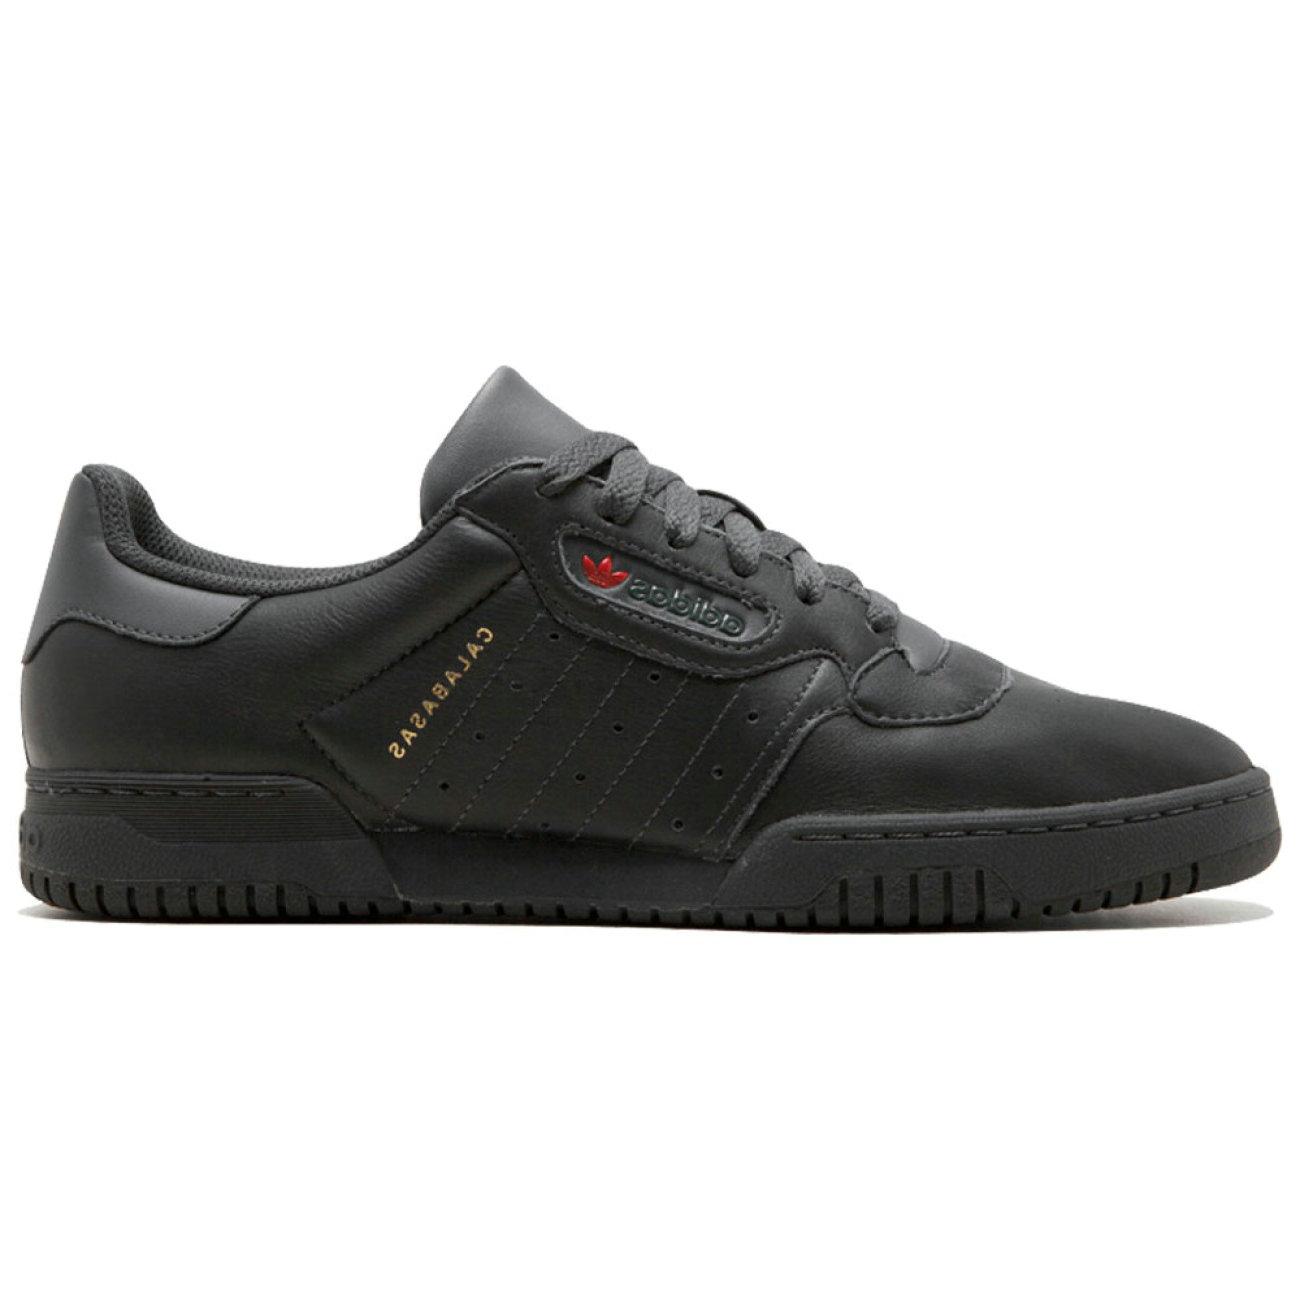 74388922f01e0 Adidas Yeezy Powerphase Calabasas Black Adidas Yeezy Powerphase ...